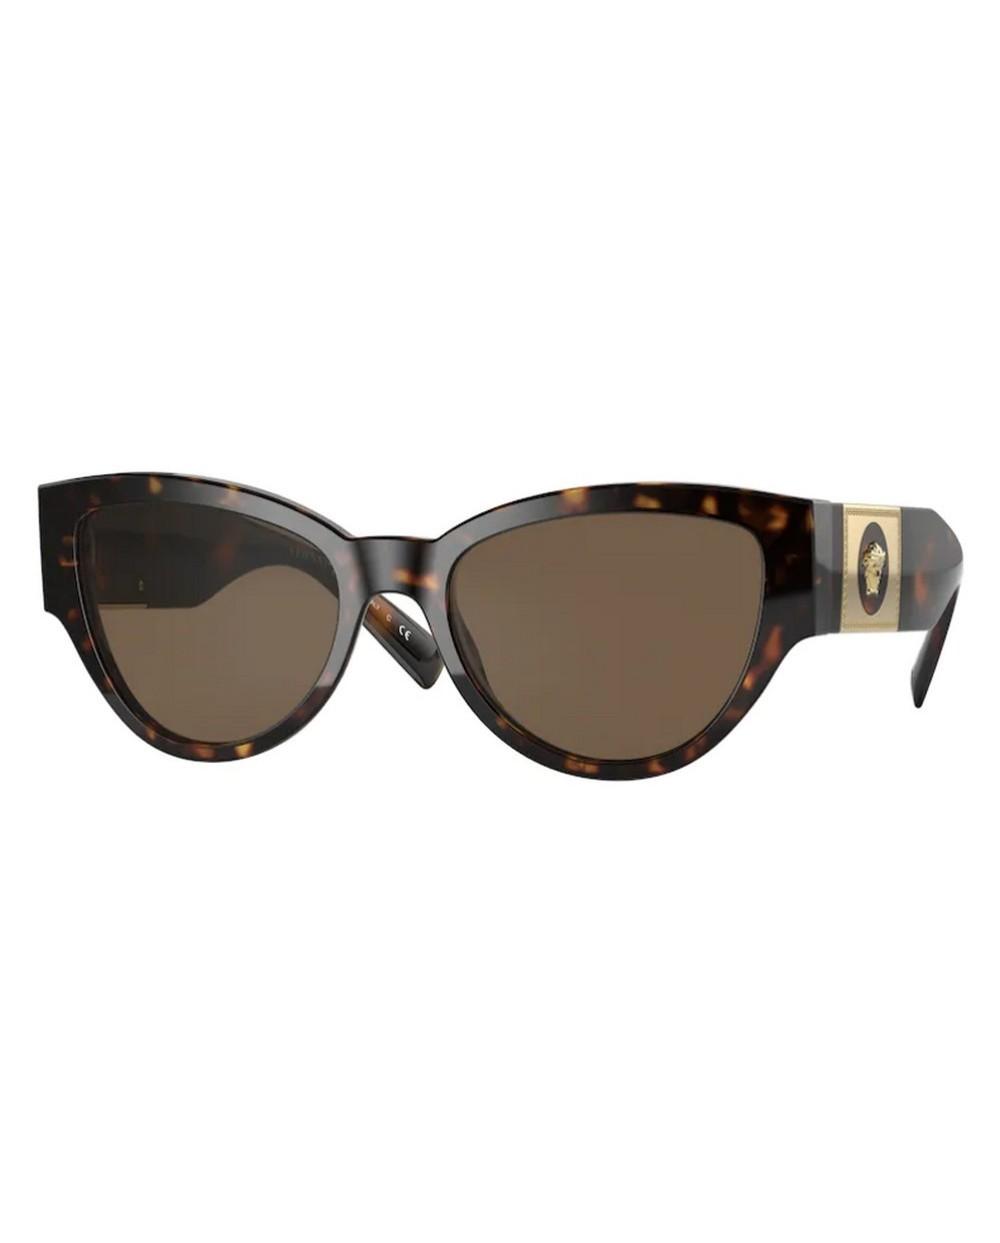 Occhiale da sole Versace VE 4398 originale garanzia italia